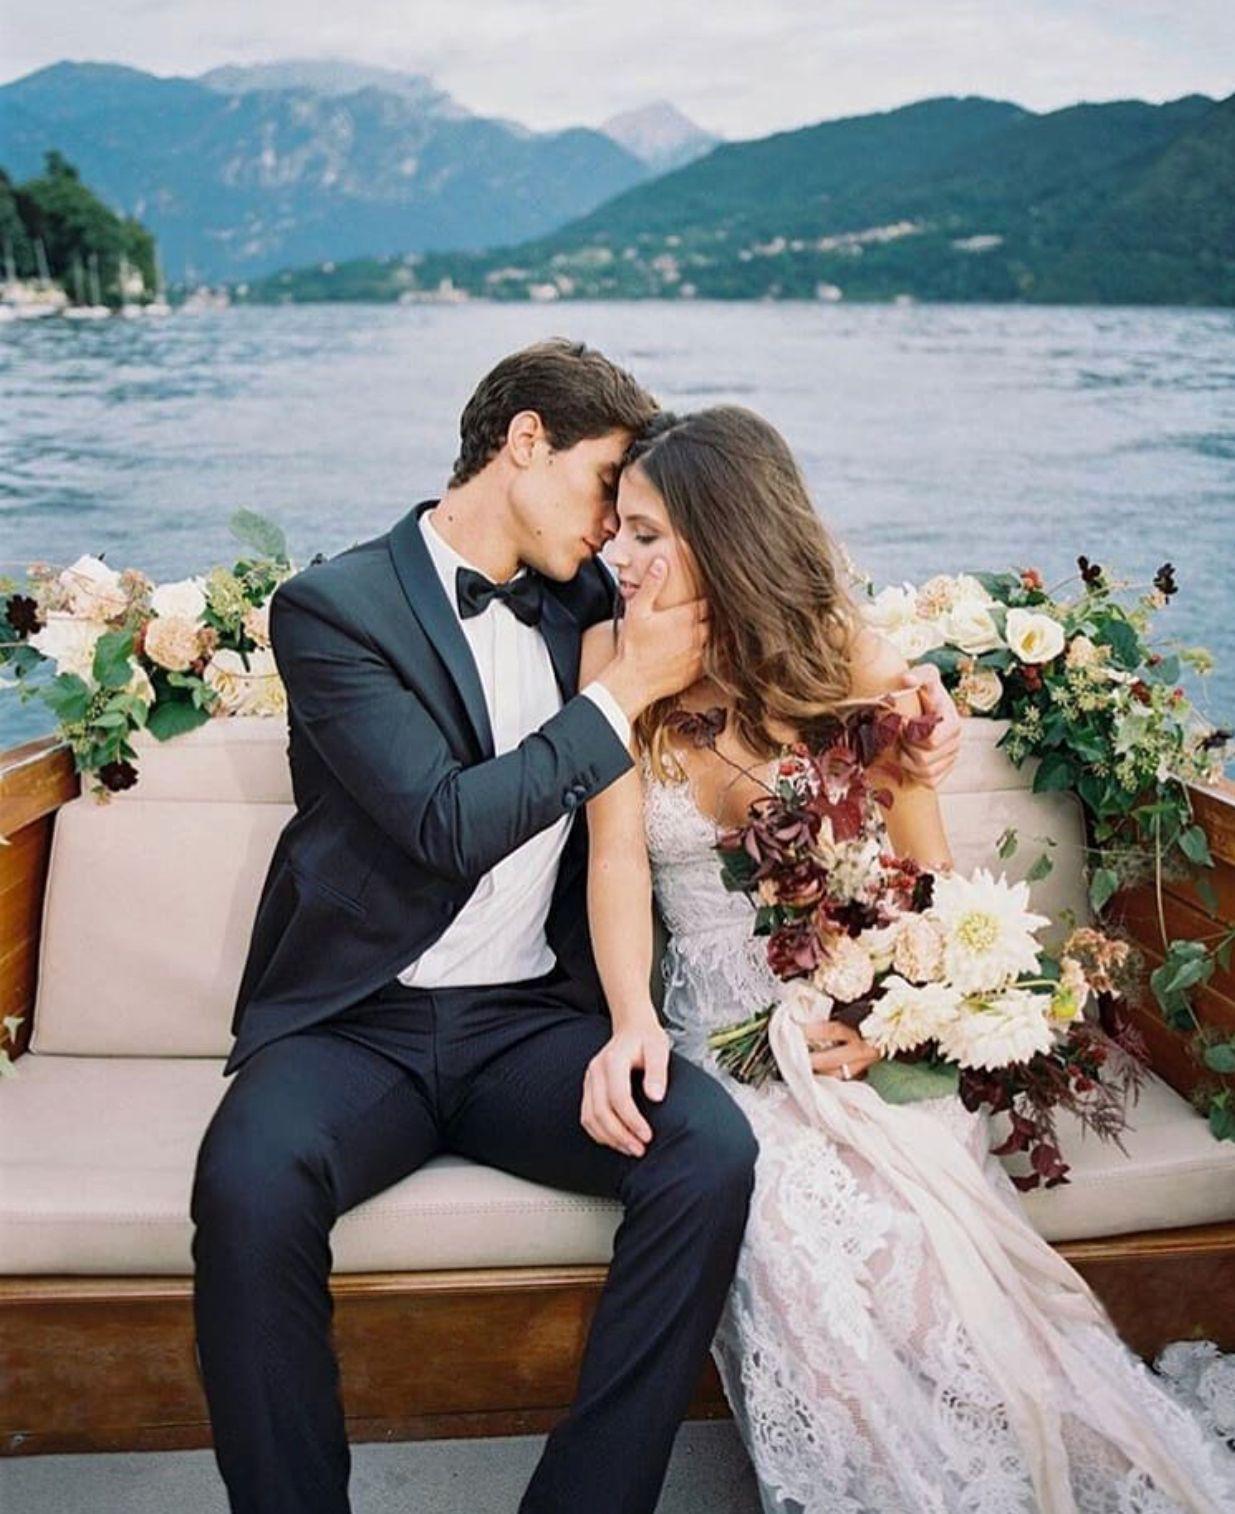 Lake Wedding Ideas: Pin By Perla Juarez On Wedding Ideas